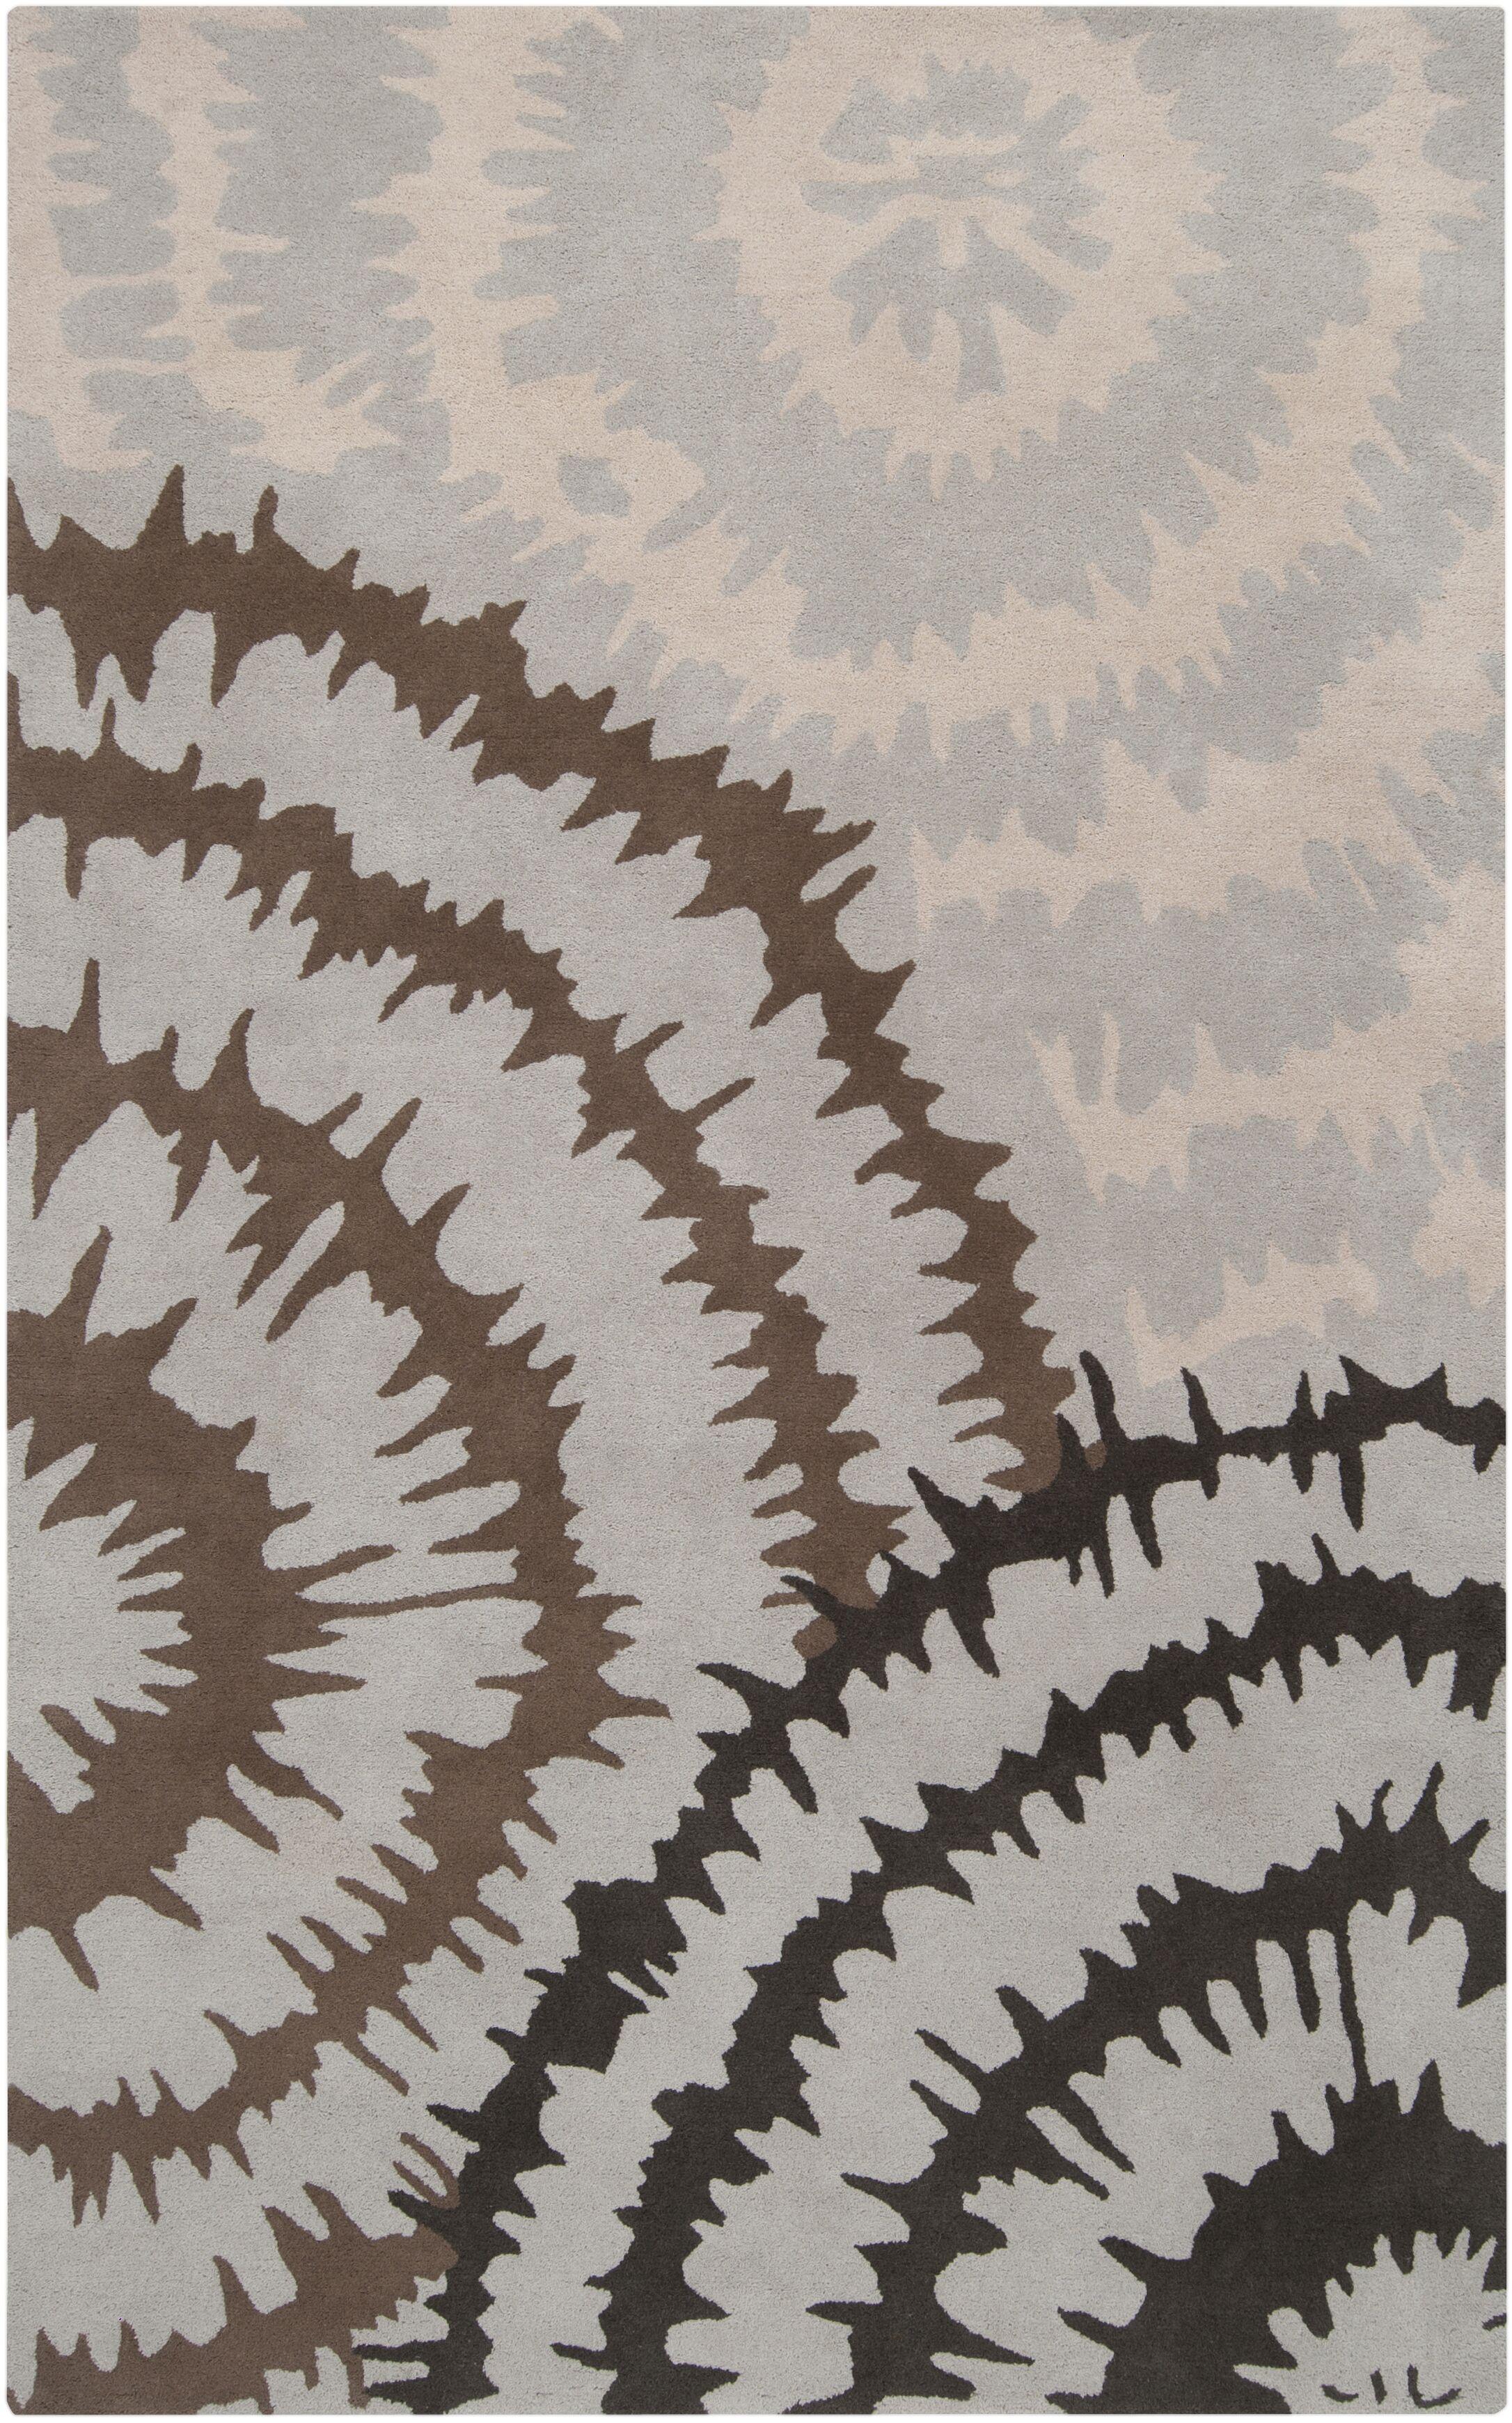 Harlequin Silvered Light Grey/Brown Floral Area Rug Rug Size: Rectangle 9' x 12'